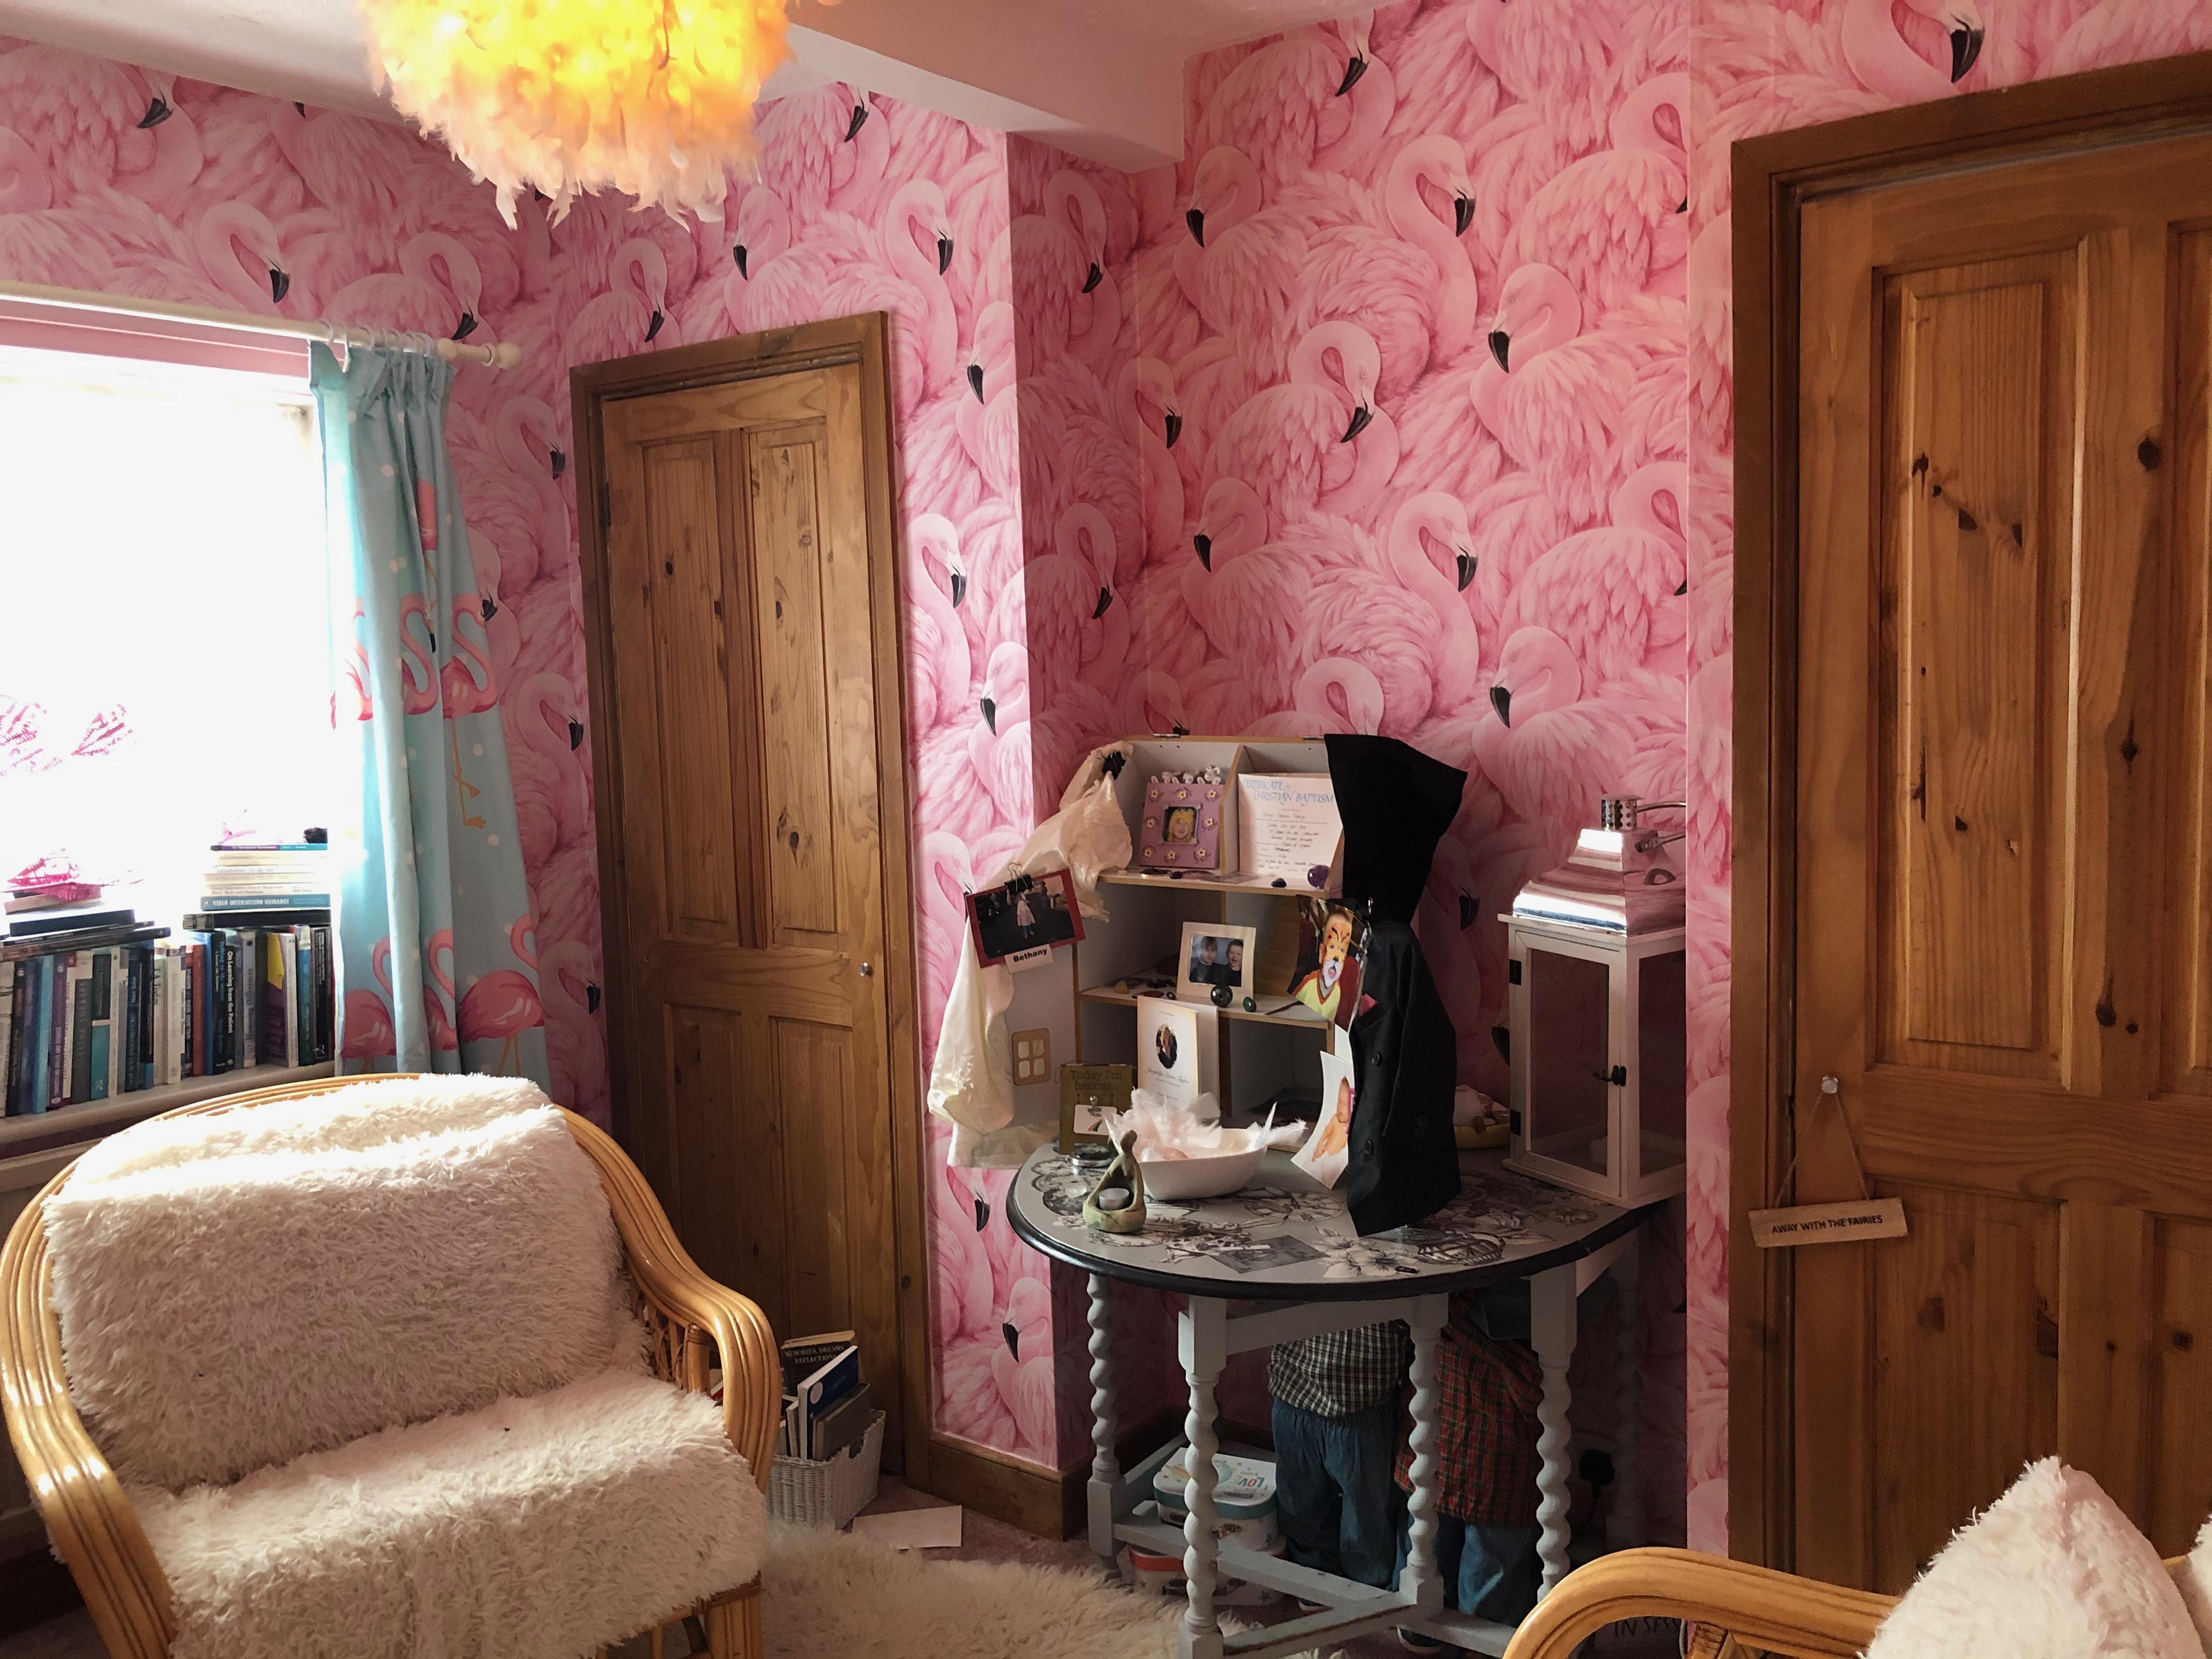 Bedroom 2 - Flamingo theme pic A